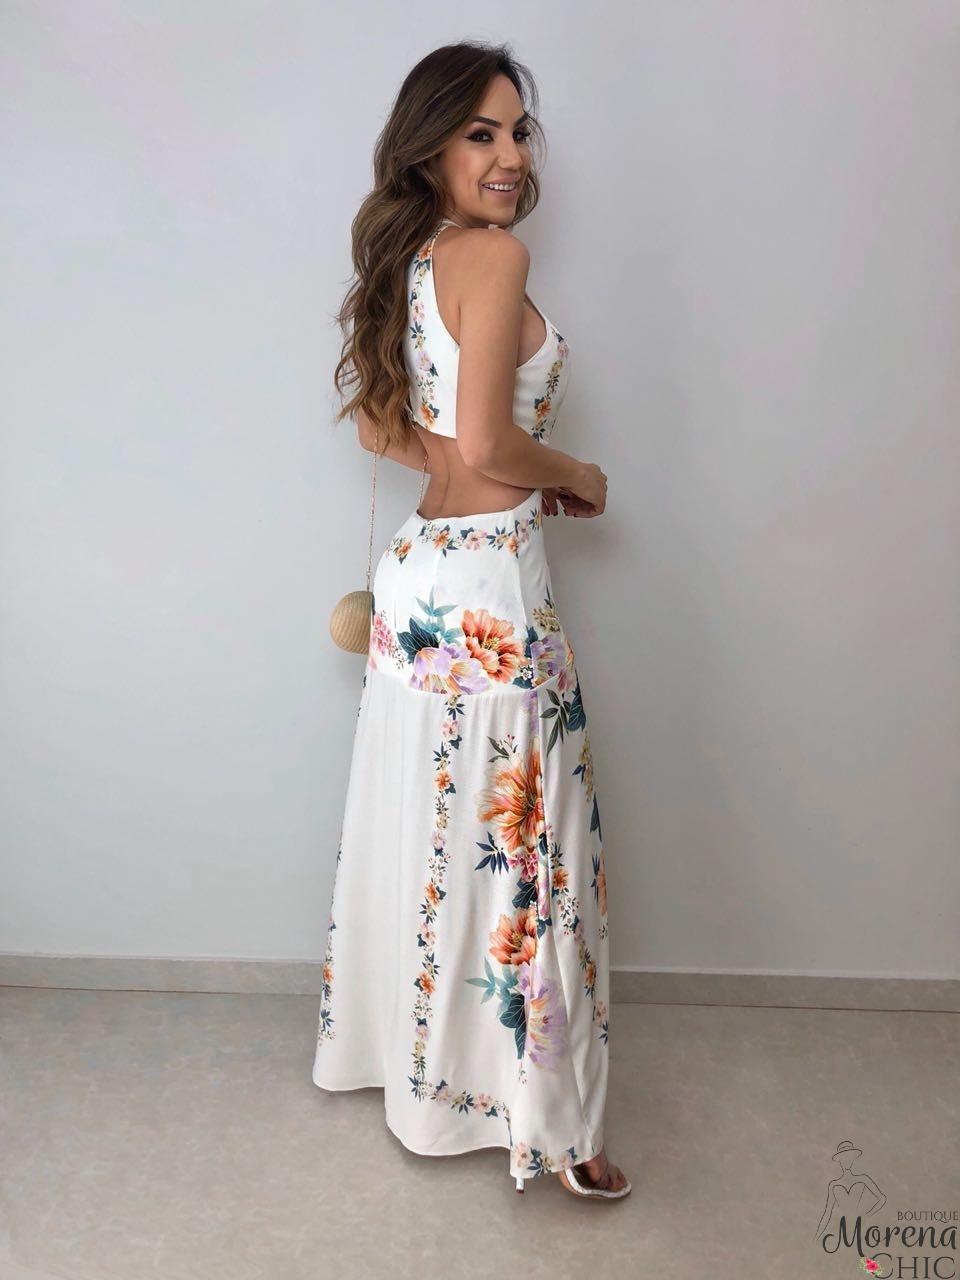 Vestido Longo Recorte Floral Farm Boutique Morena Chic